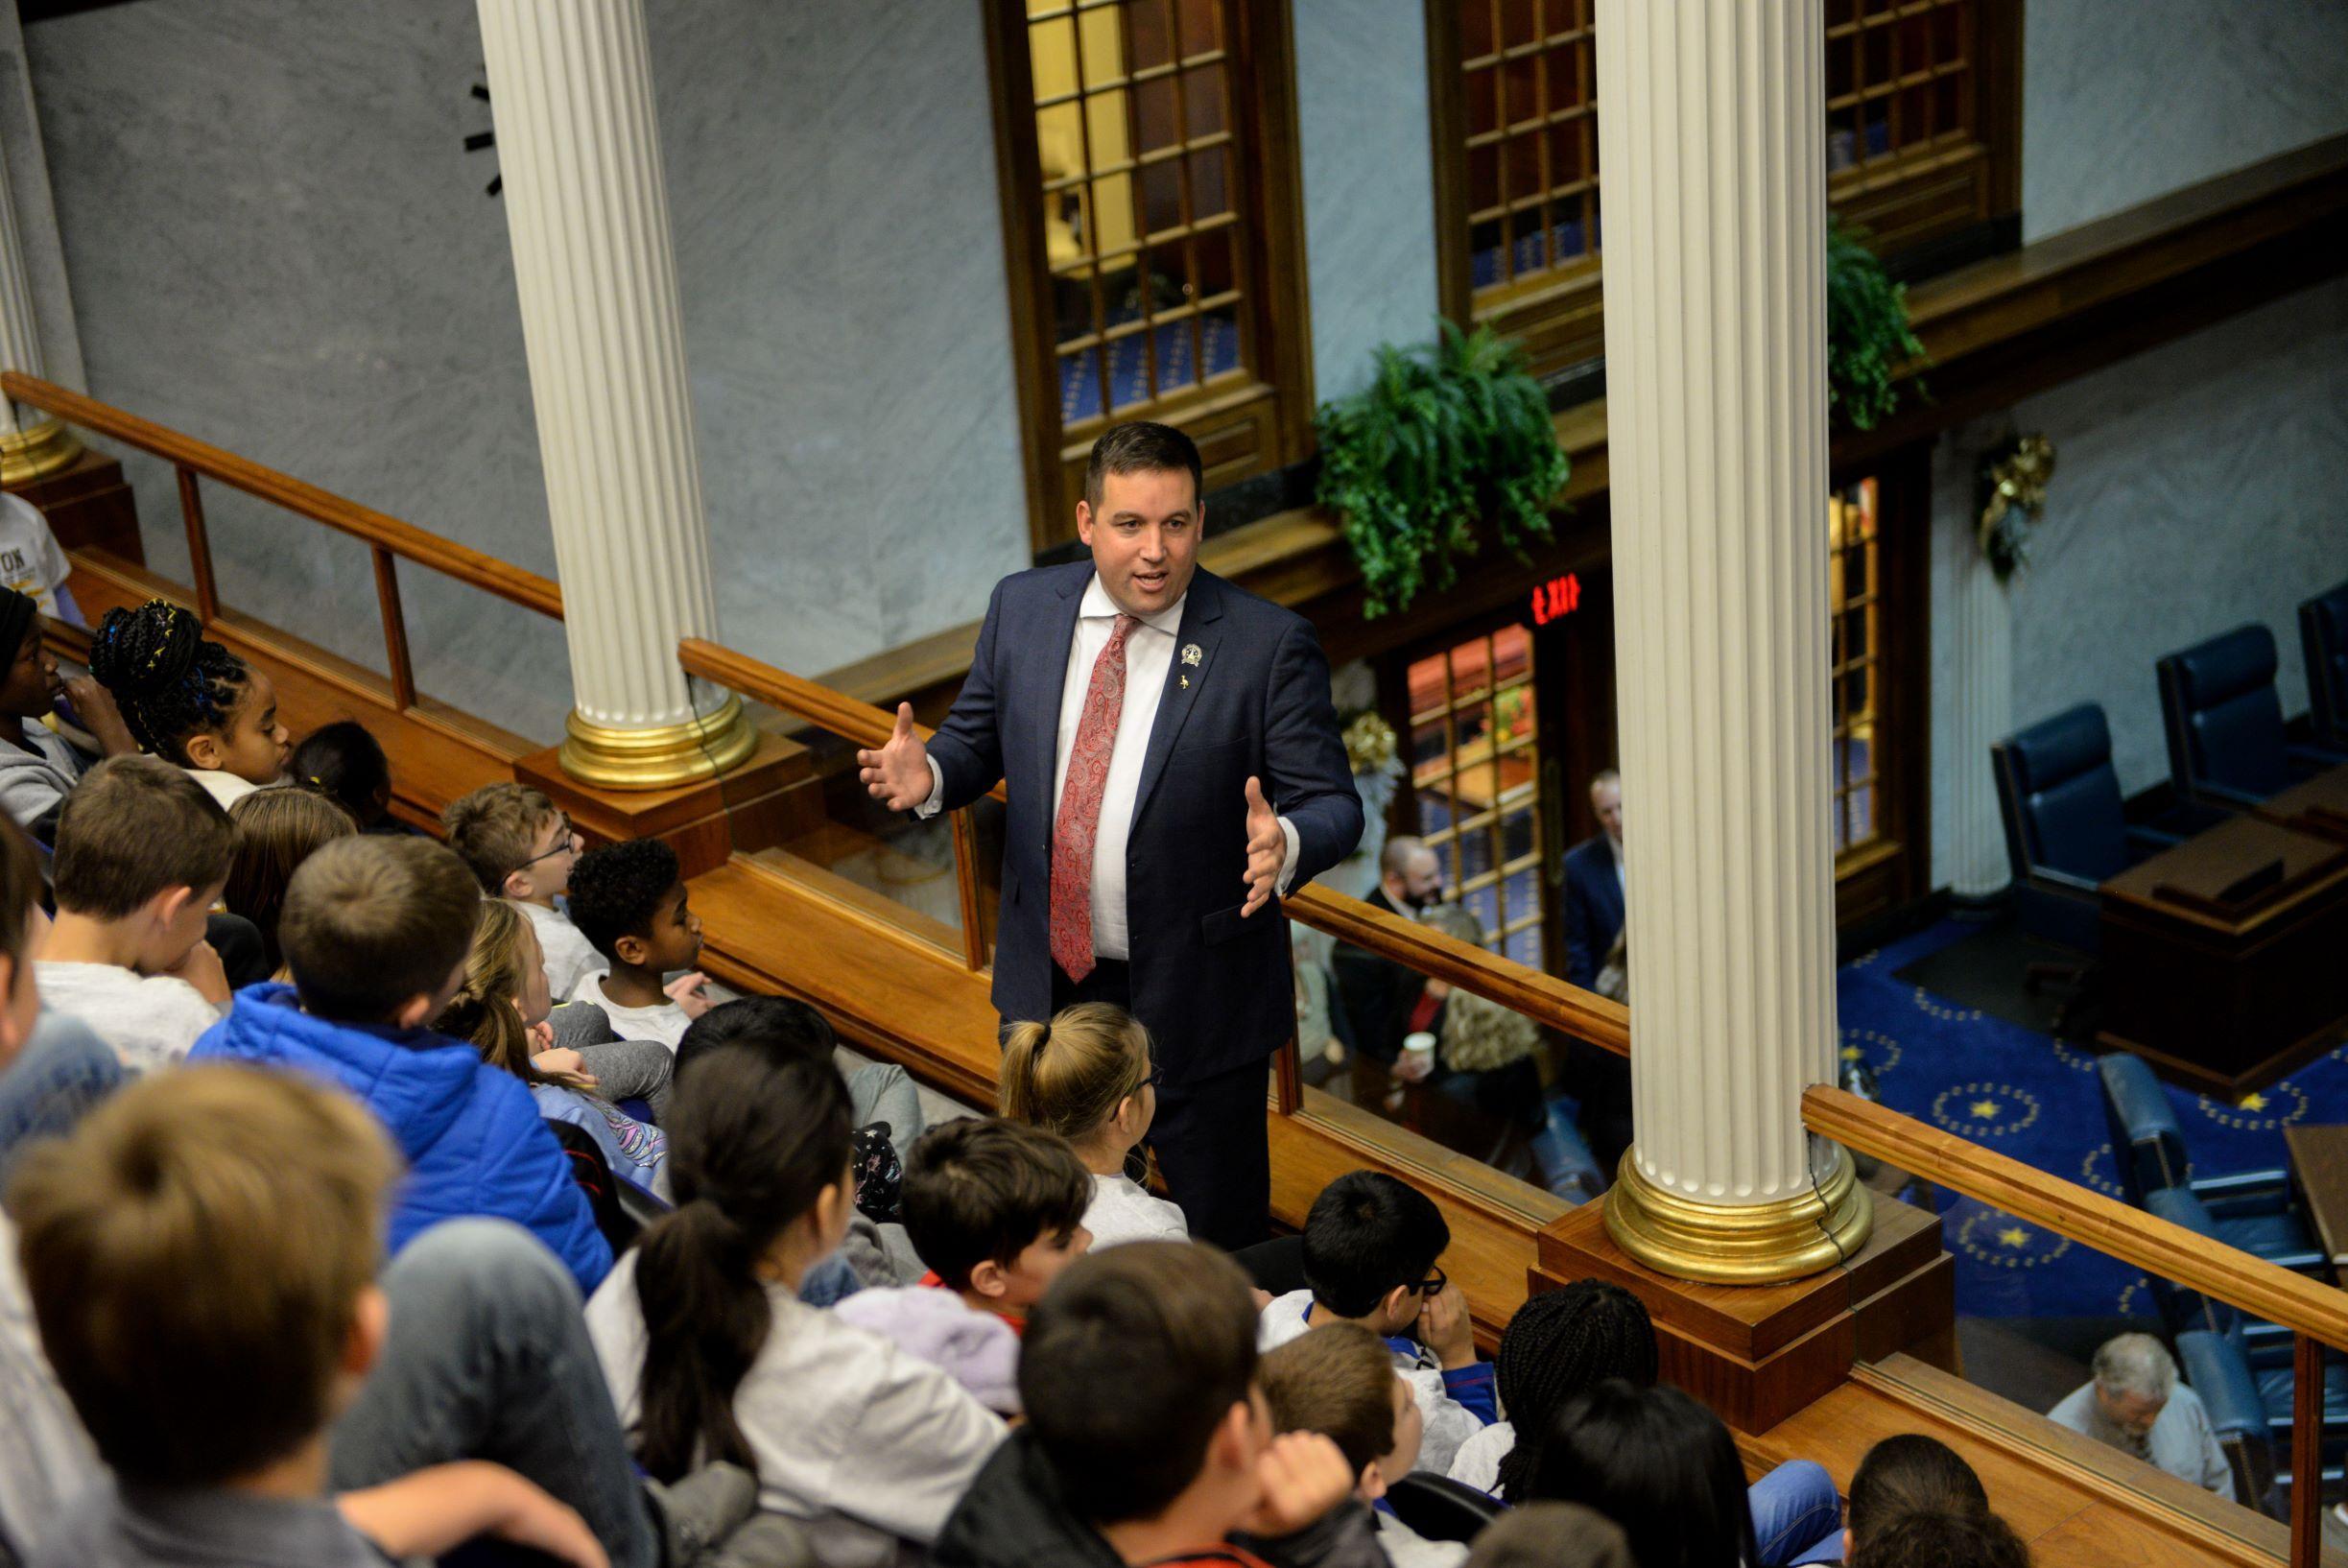 Sen. Crane speaks with schoolchildren